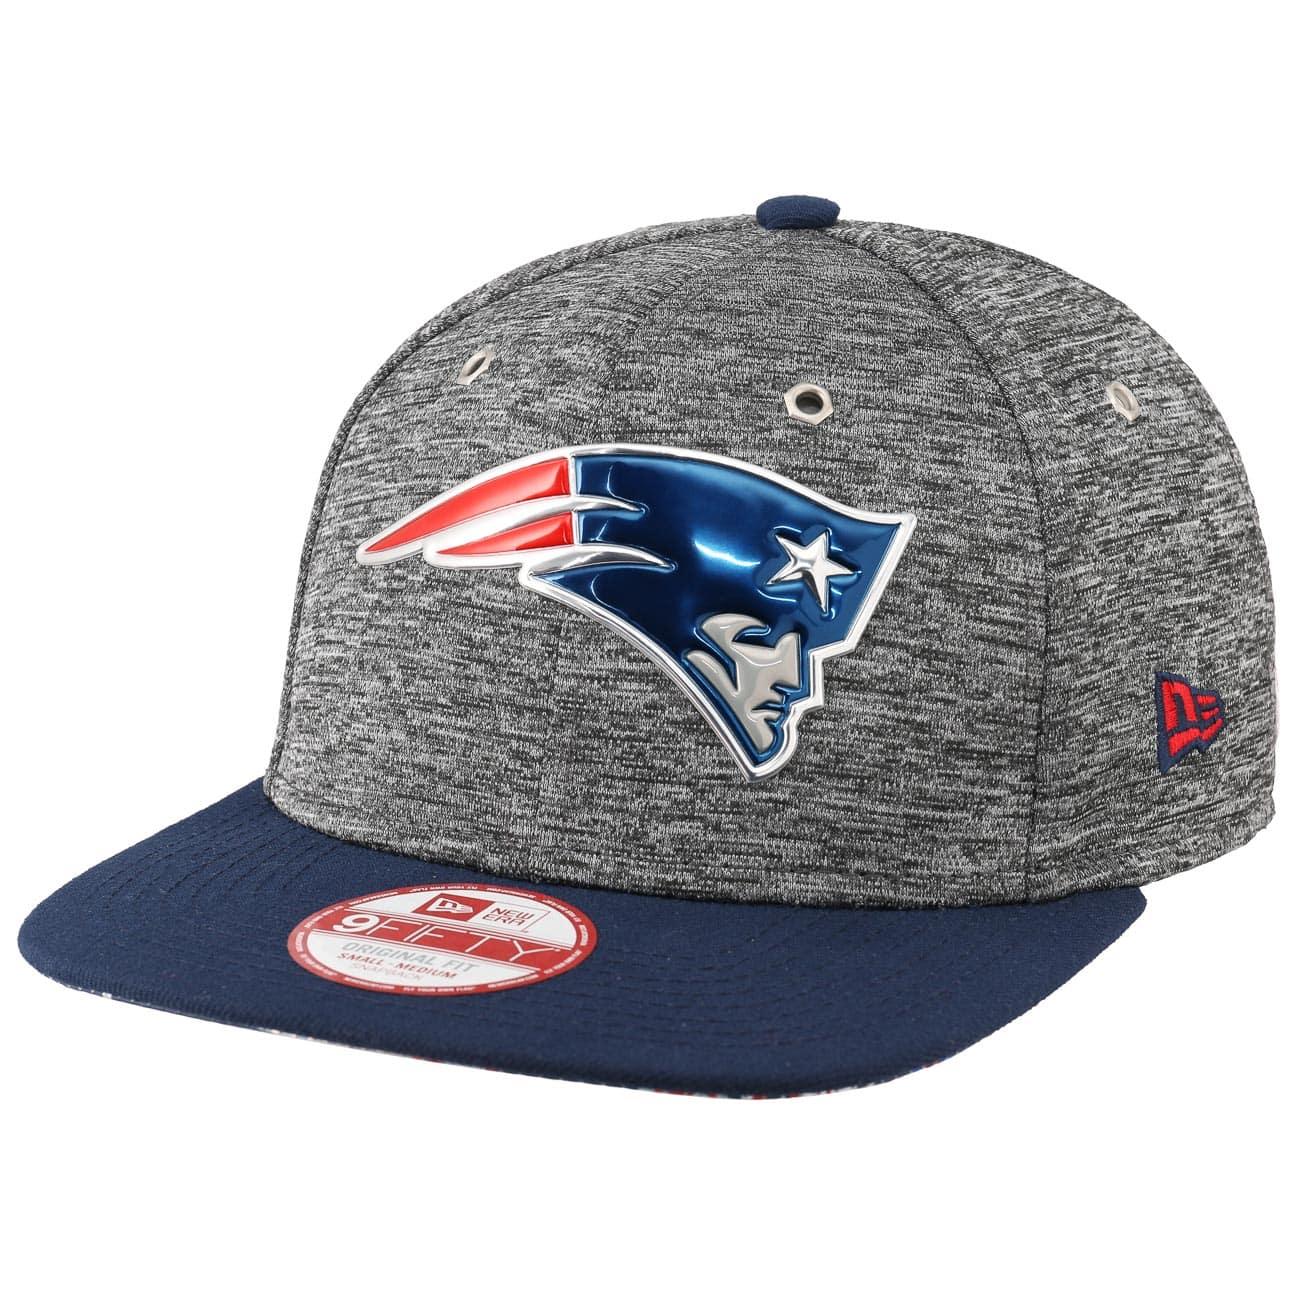 NFL Draft Patriots Cap by New Era, EUR 39,95 gt; Hats, caps  beanies shop online  Hatshopping.com